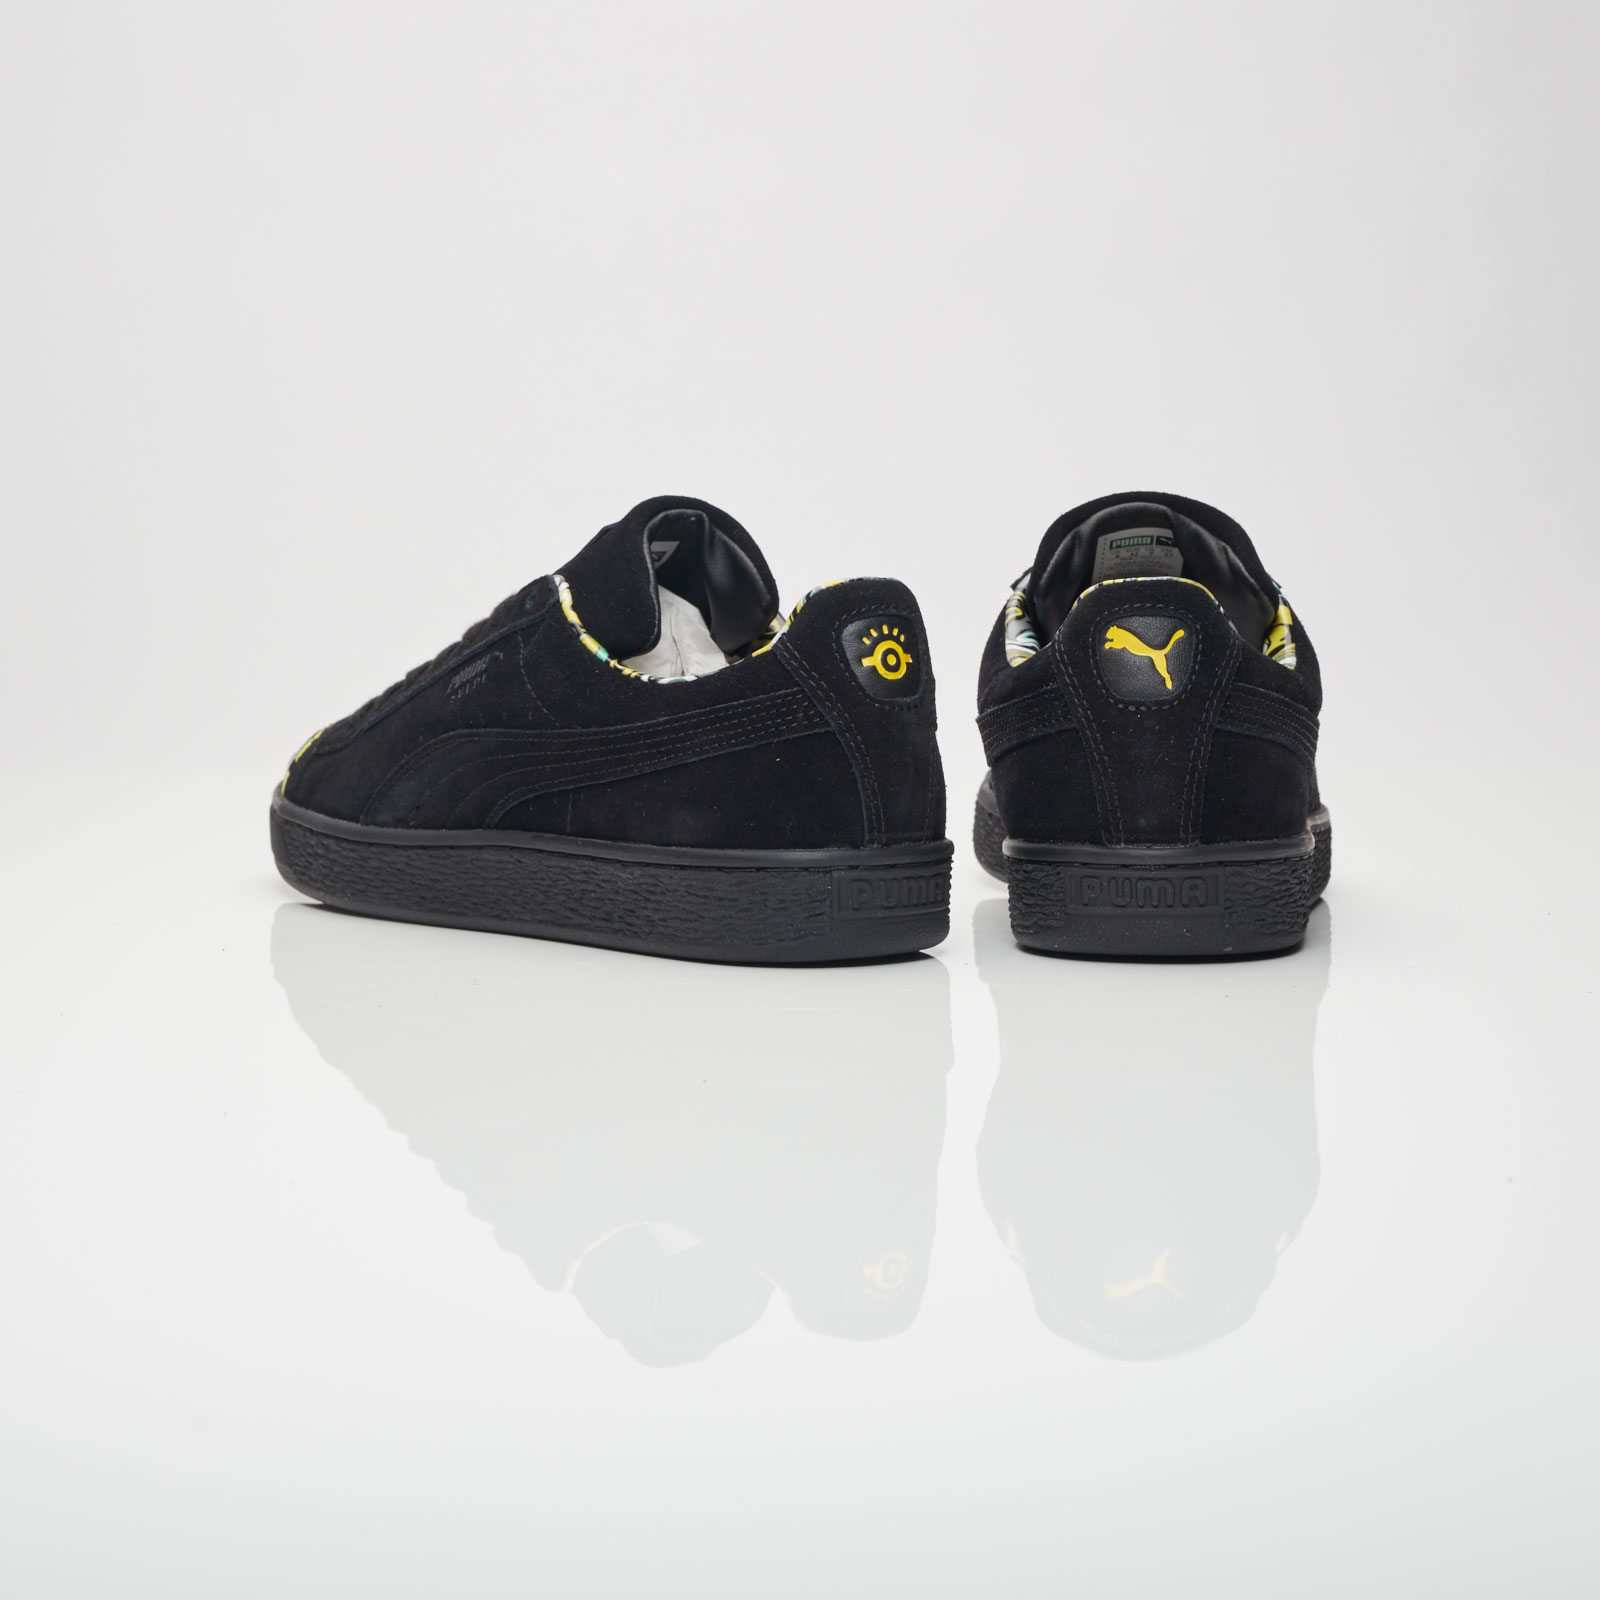 Puma X Minions Suede 365668 01 Sneakersnstuff | sneakers